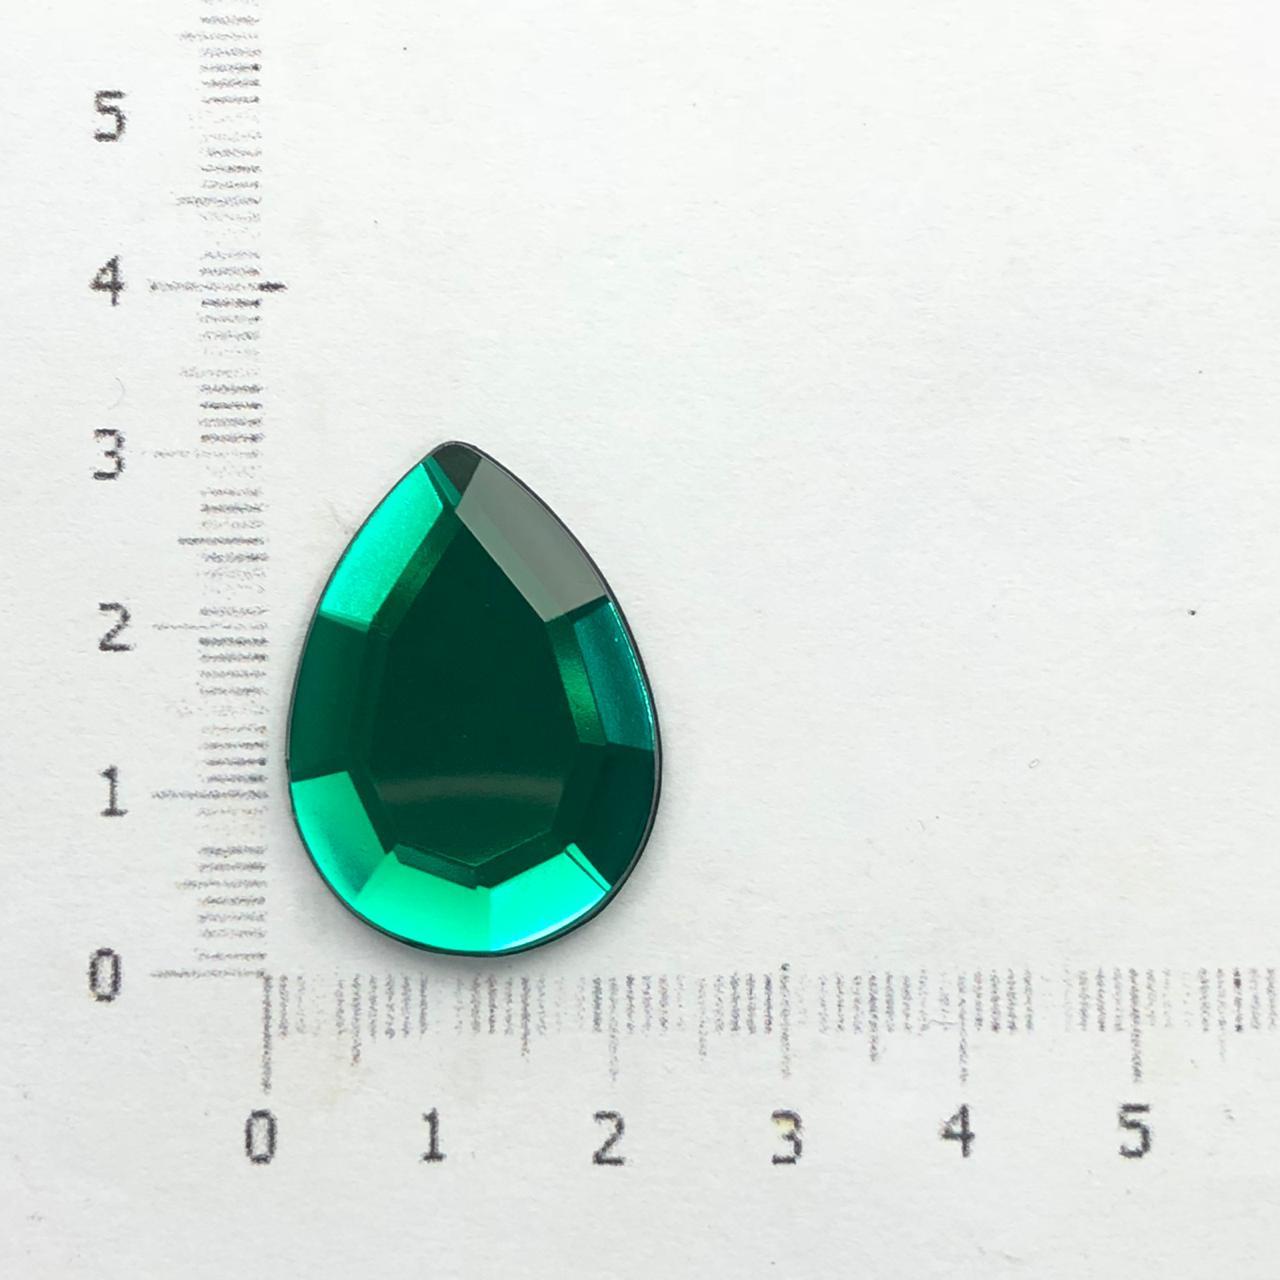 CHT129 - Chaton Gota 18x25 Esmeralda - 2Unids